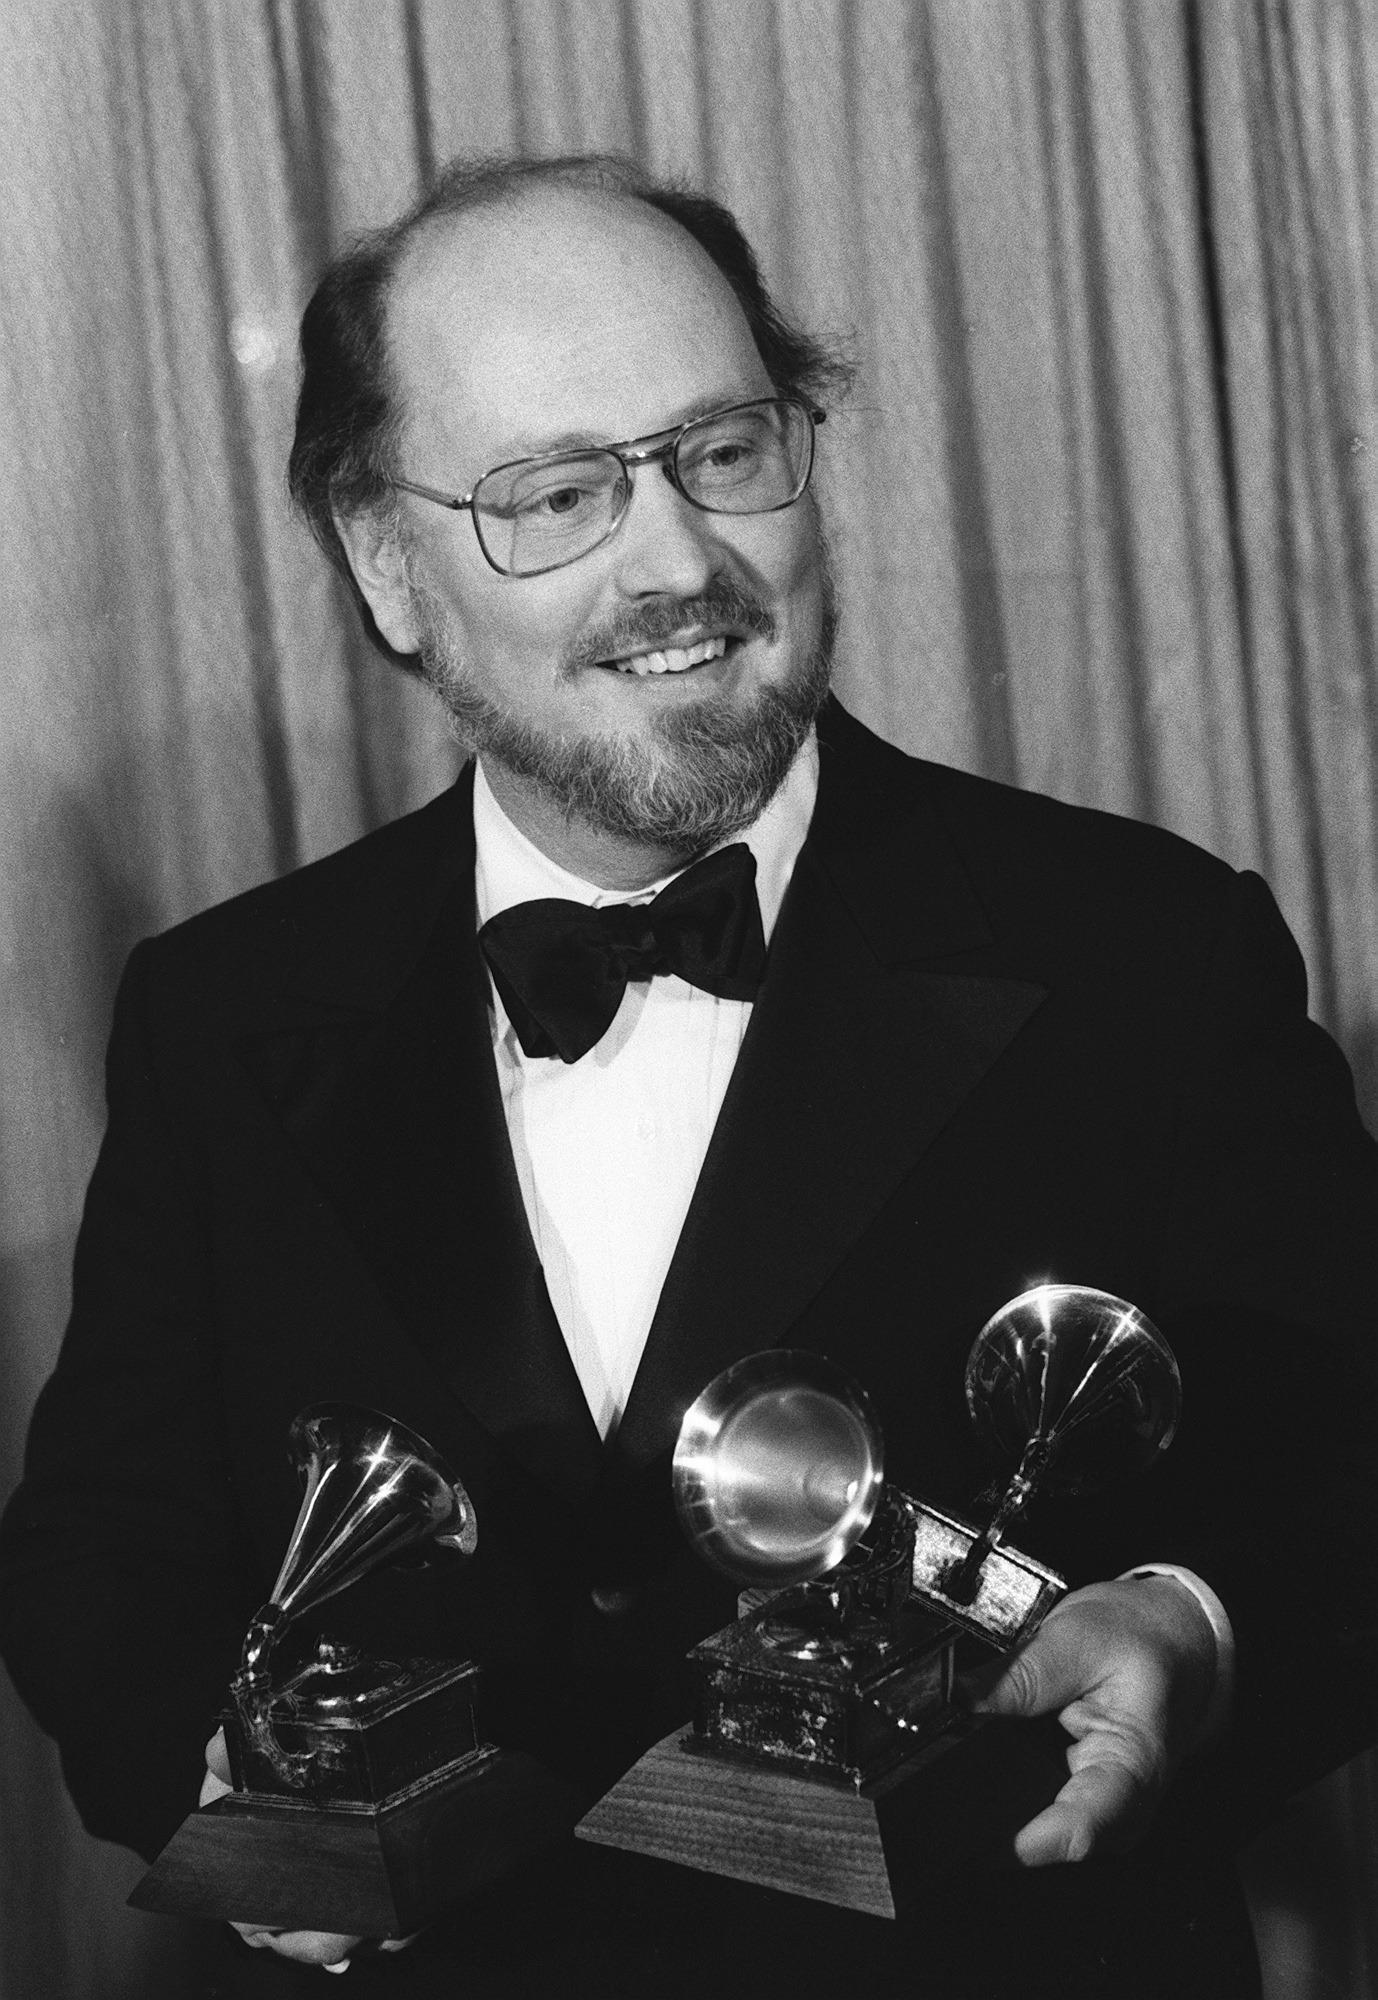 John Williams grammy awards